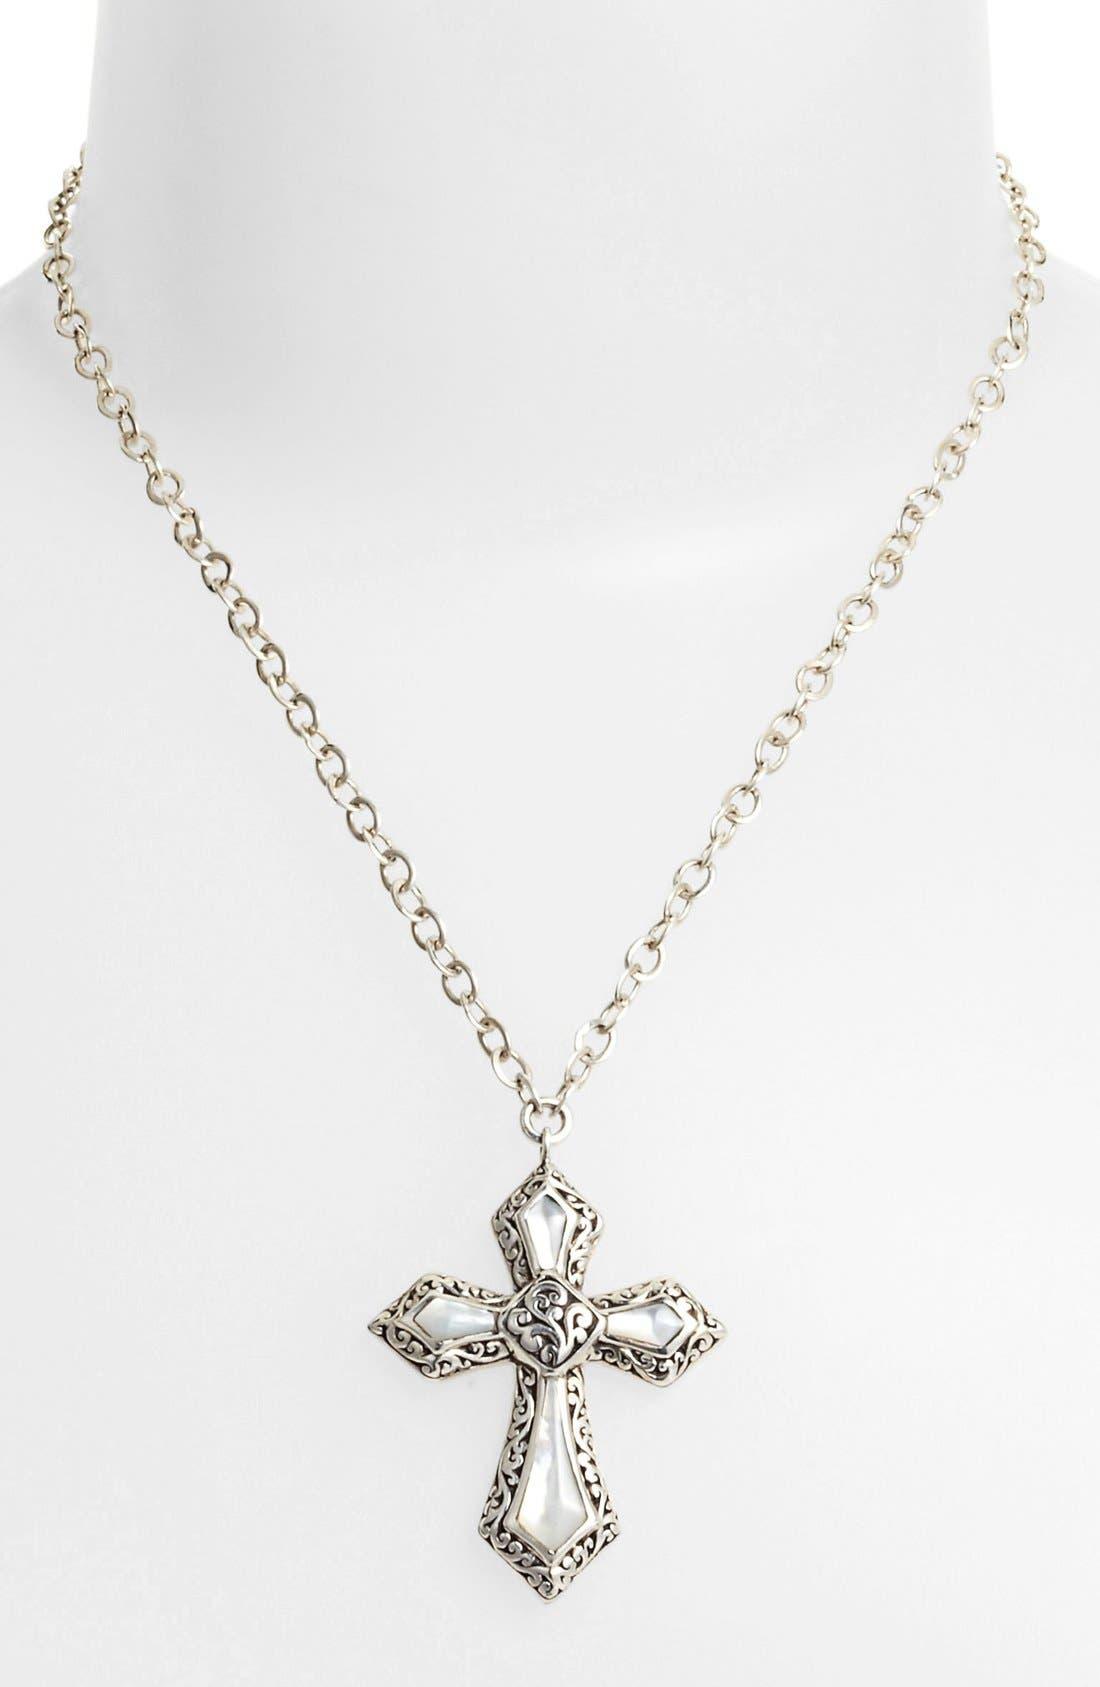 Main Image - Lois Hill Cross Pendant Necklace